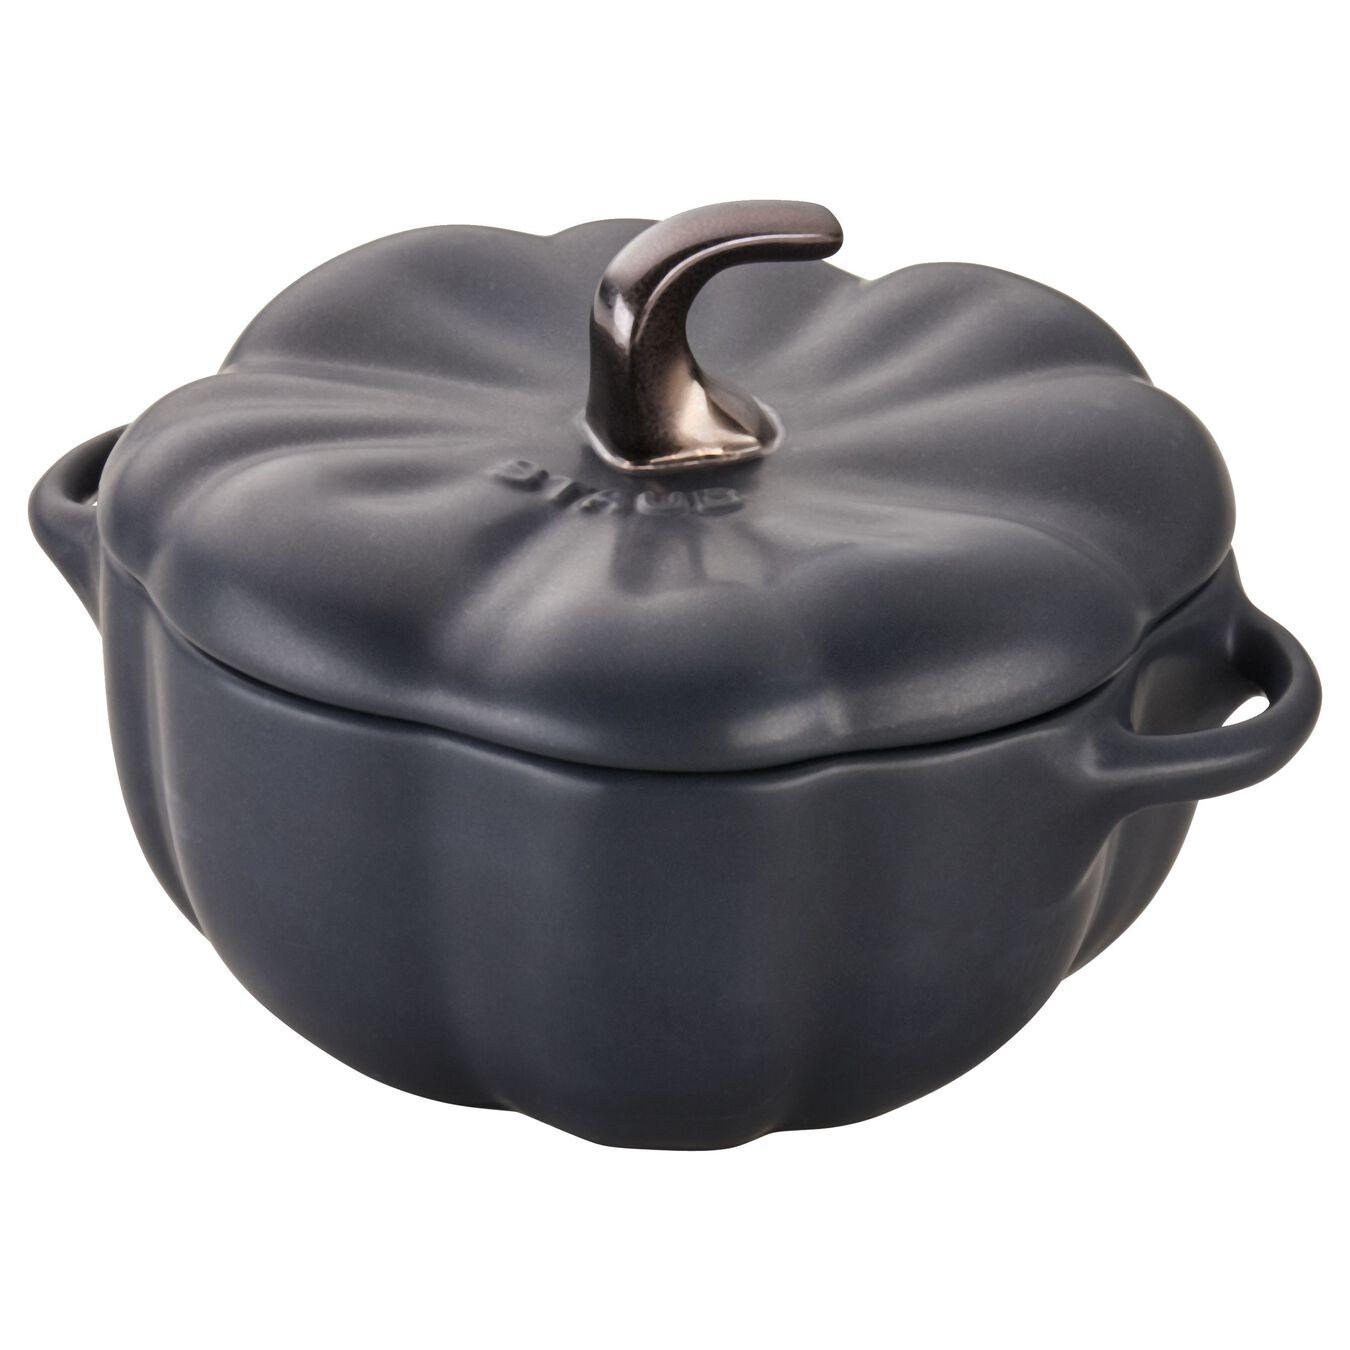 500 ml Ceramic pumpkin Cocotte, Black,,large 7